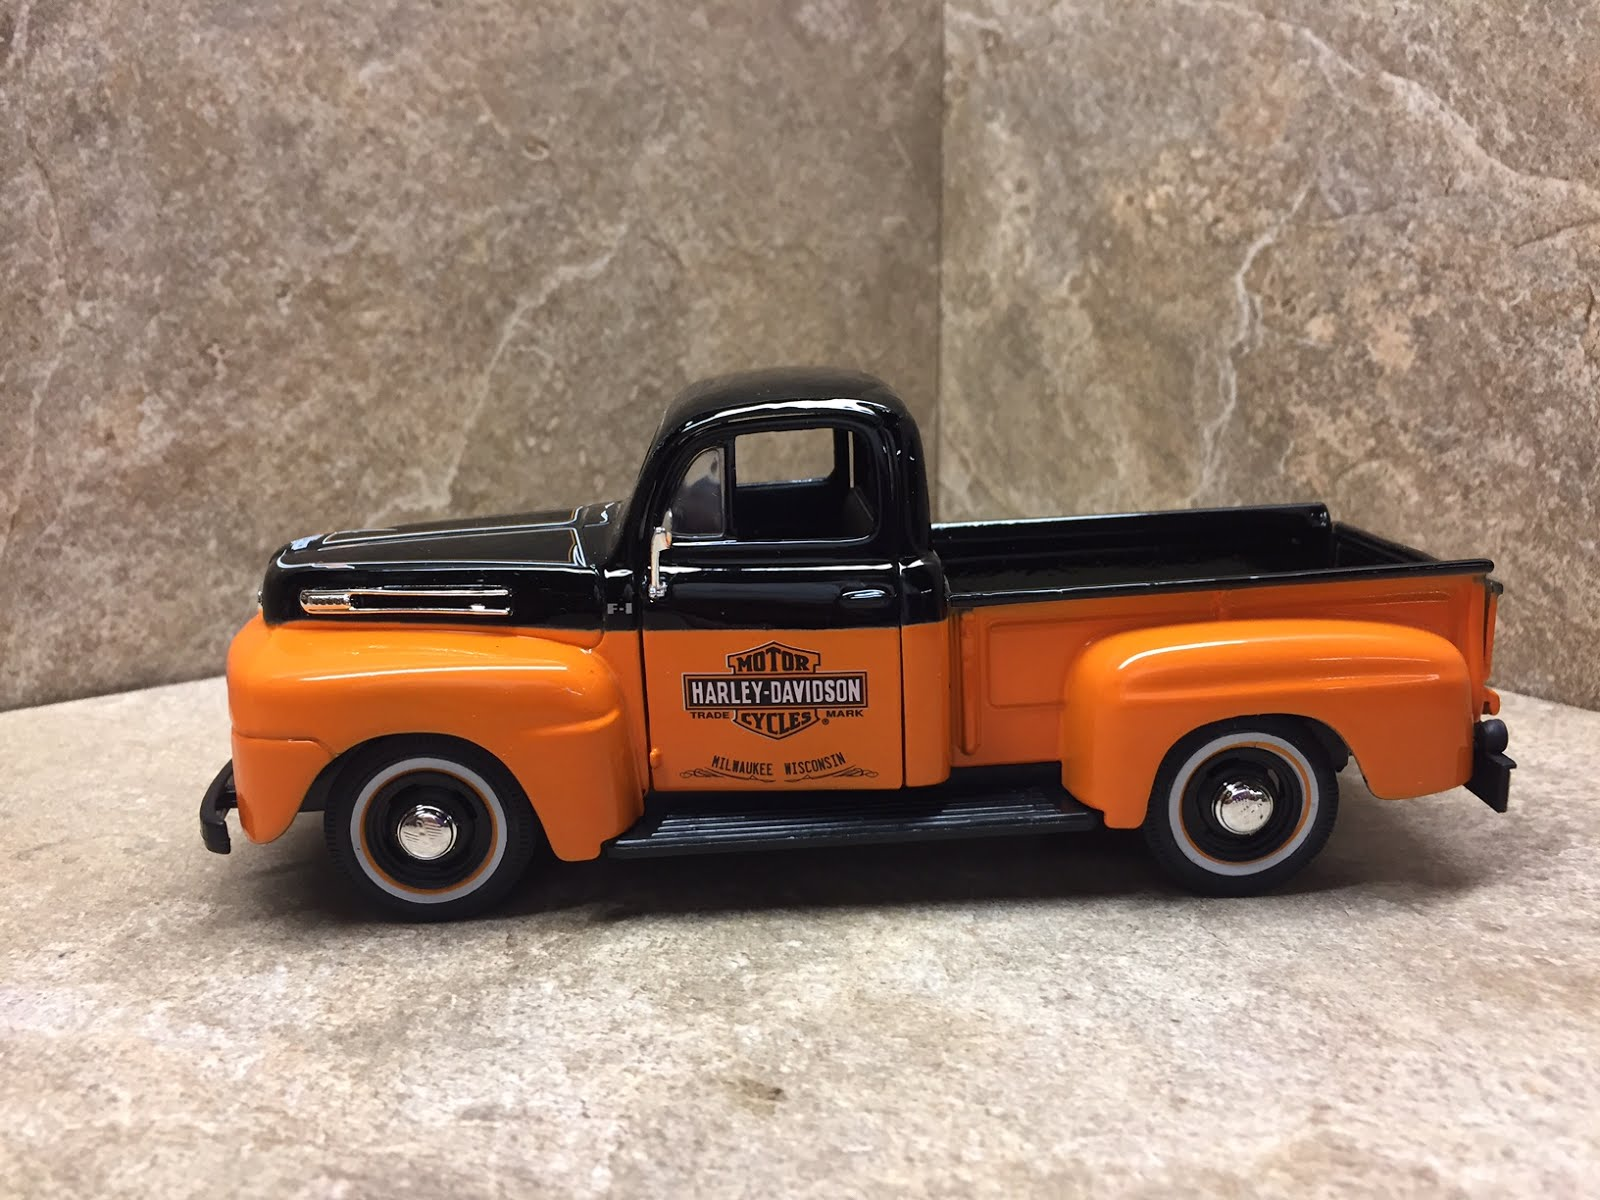 1948 Ford Pickup truck (Harley Davidson)